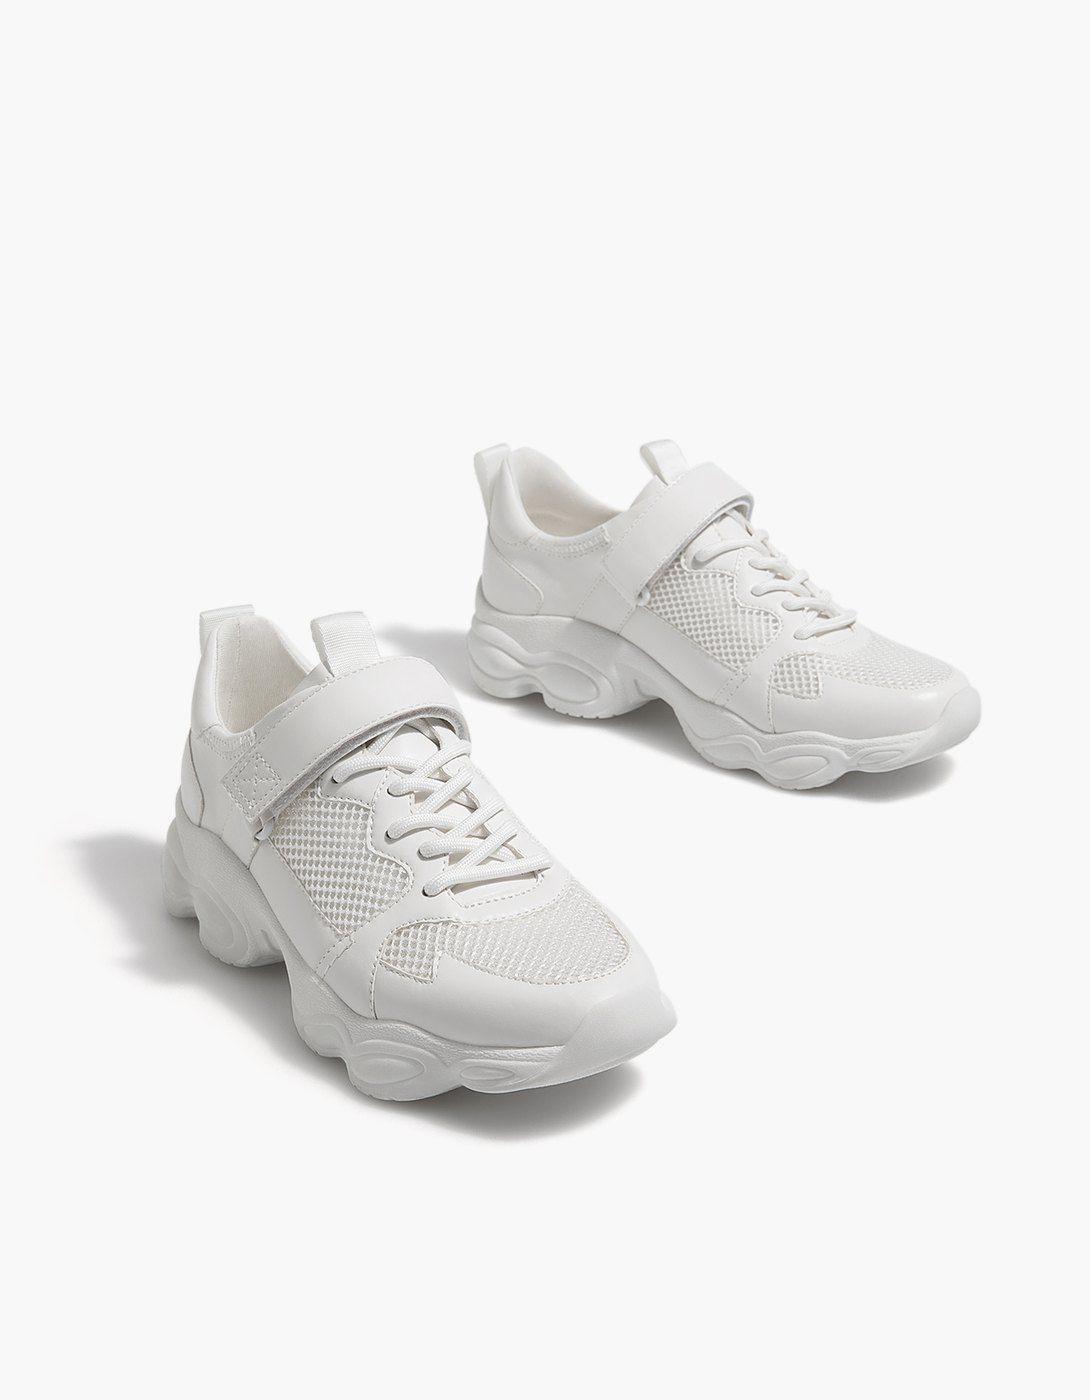 the latest 24b8c ff5c2 White contrasting sneakers - All   Stradivarius United Kingdom Huaraches,  Nike Huarache, Summer Sale